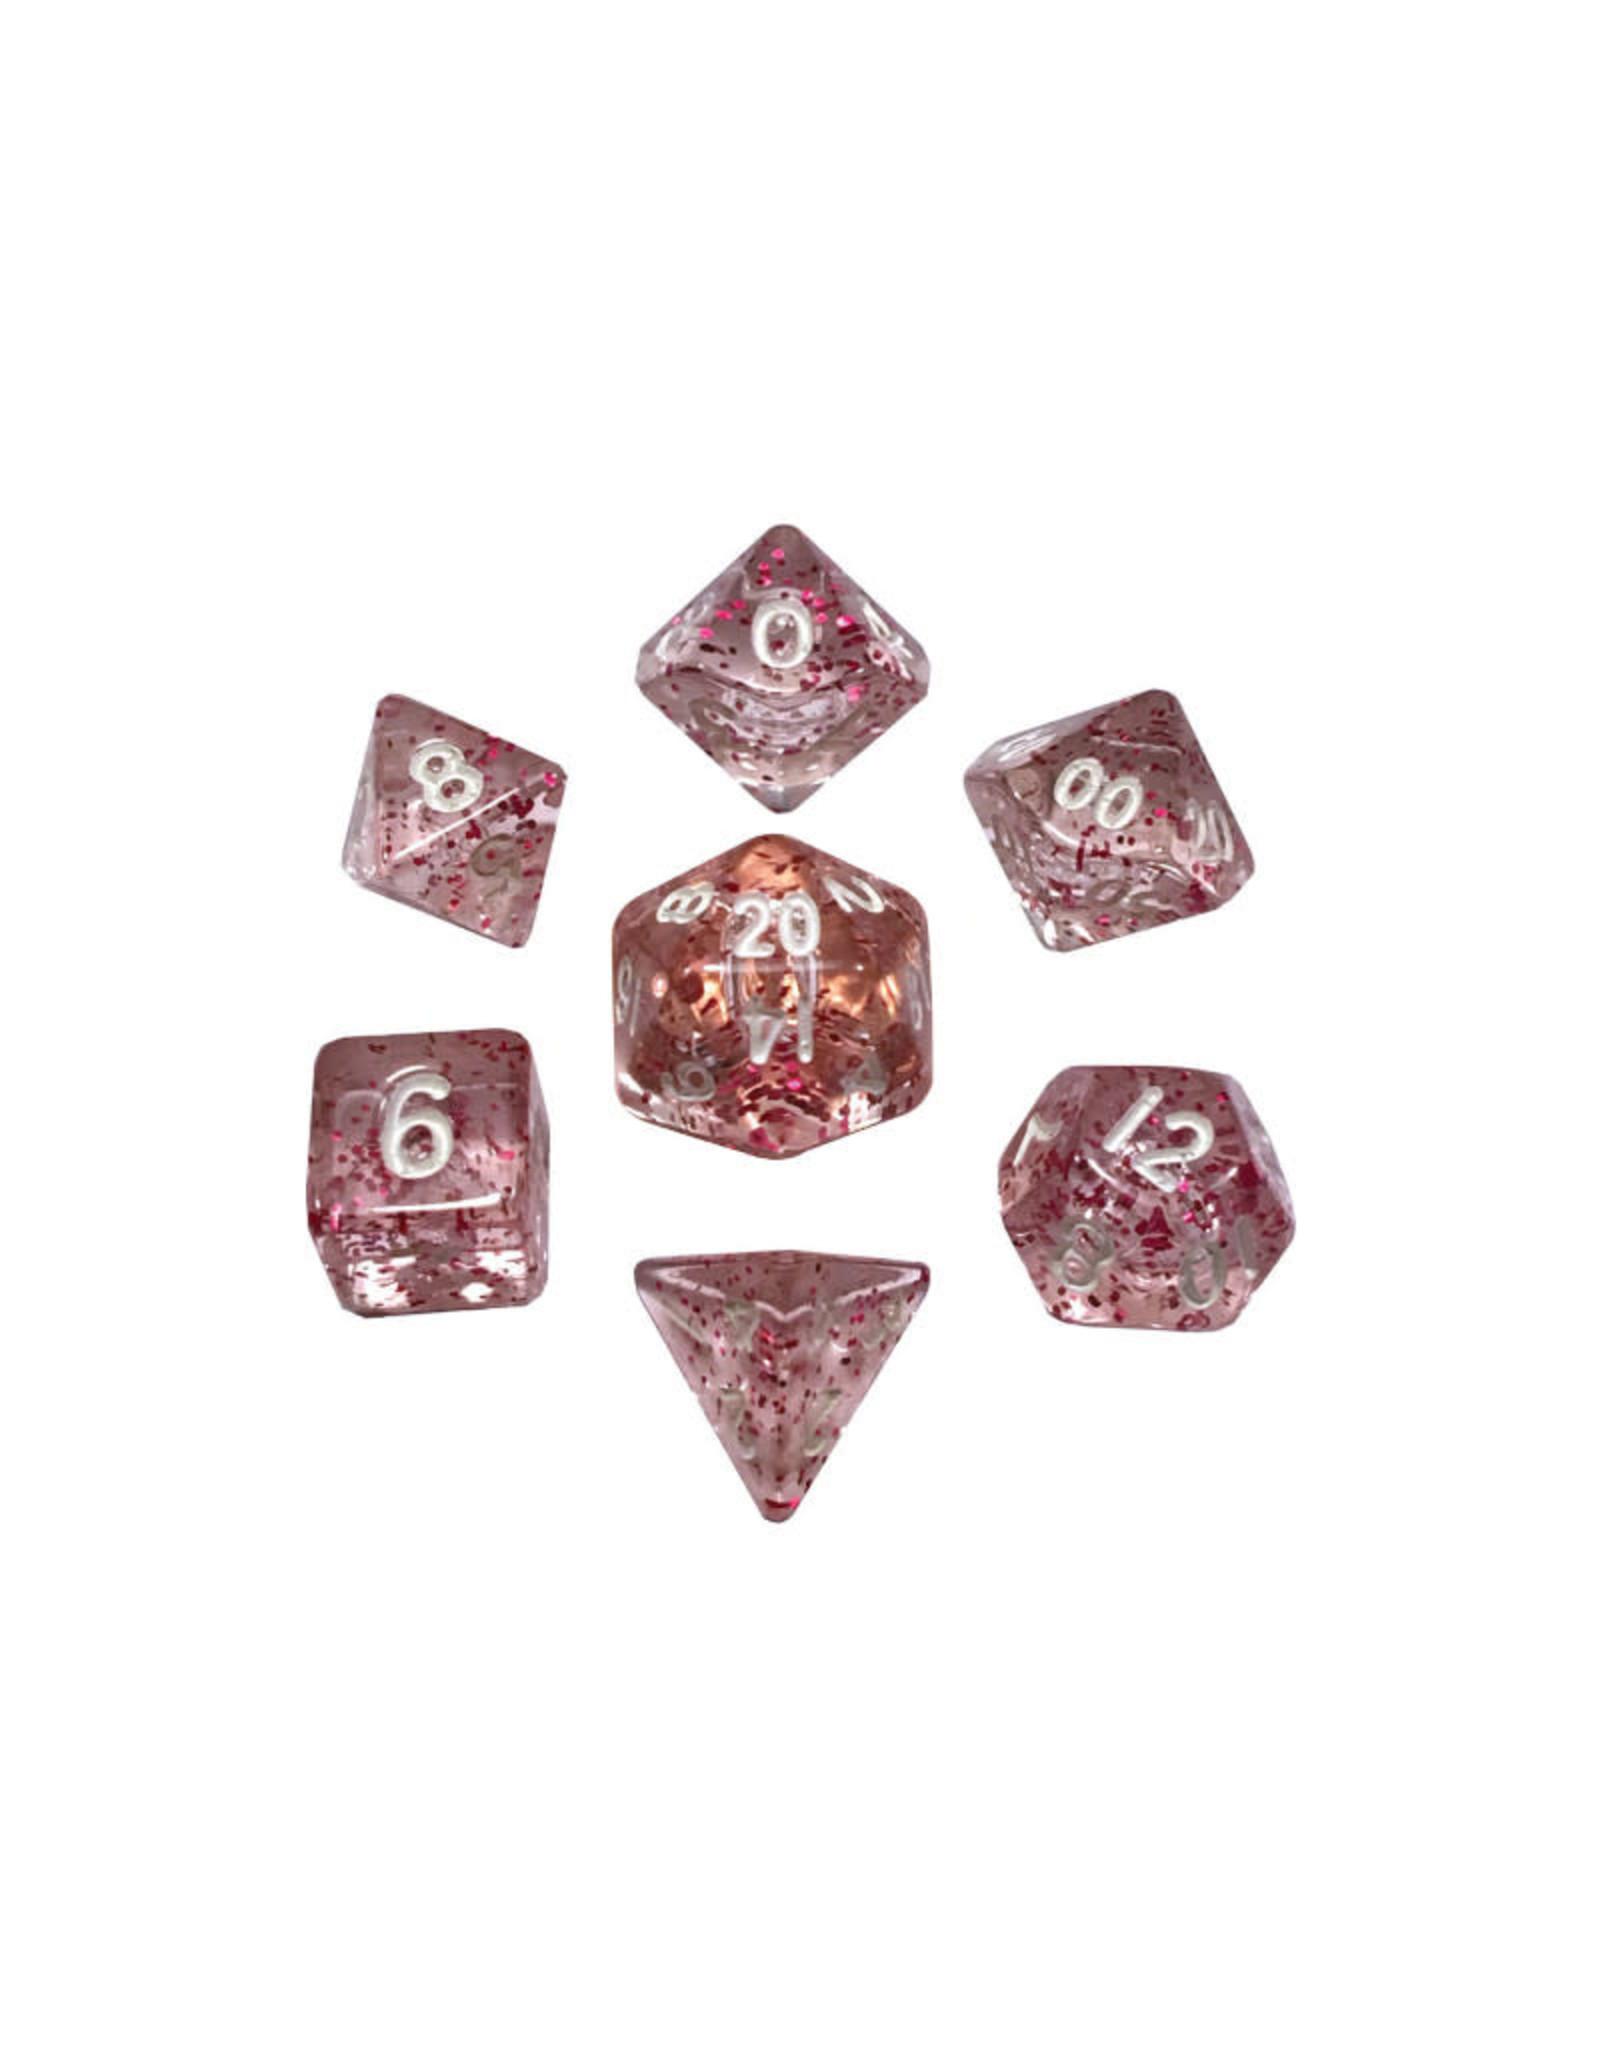 Metallic Dice Games Mini Polyhedral Dice Set: Ethereal Light Purple